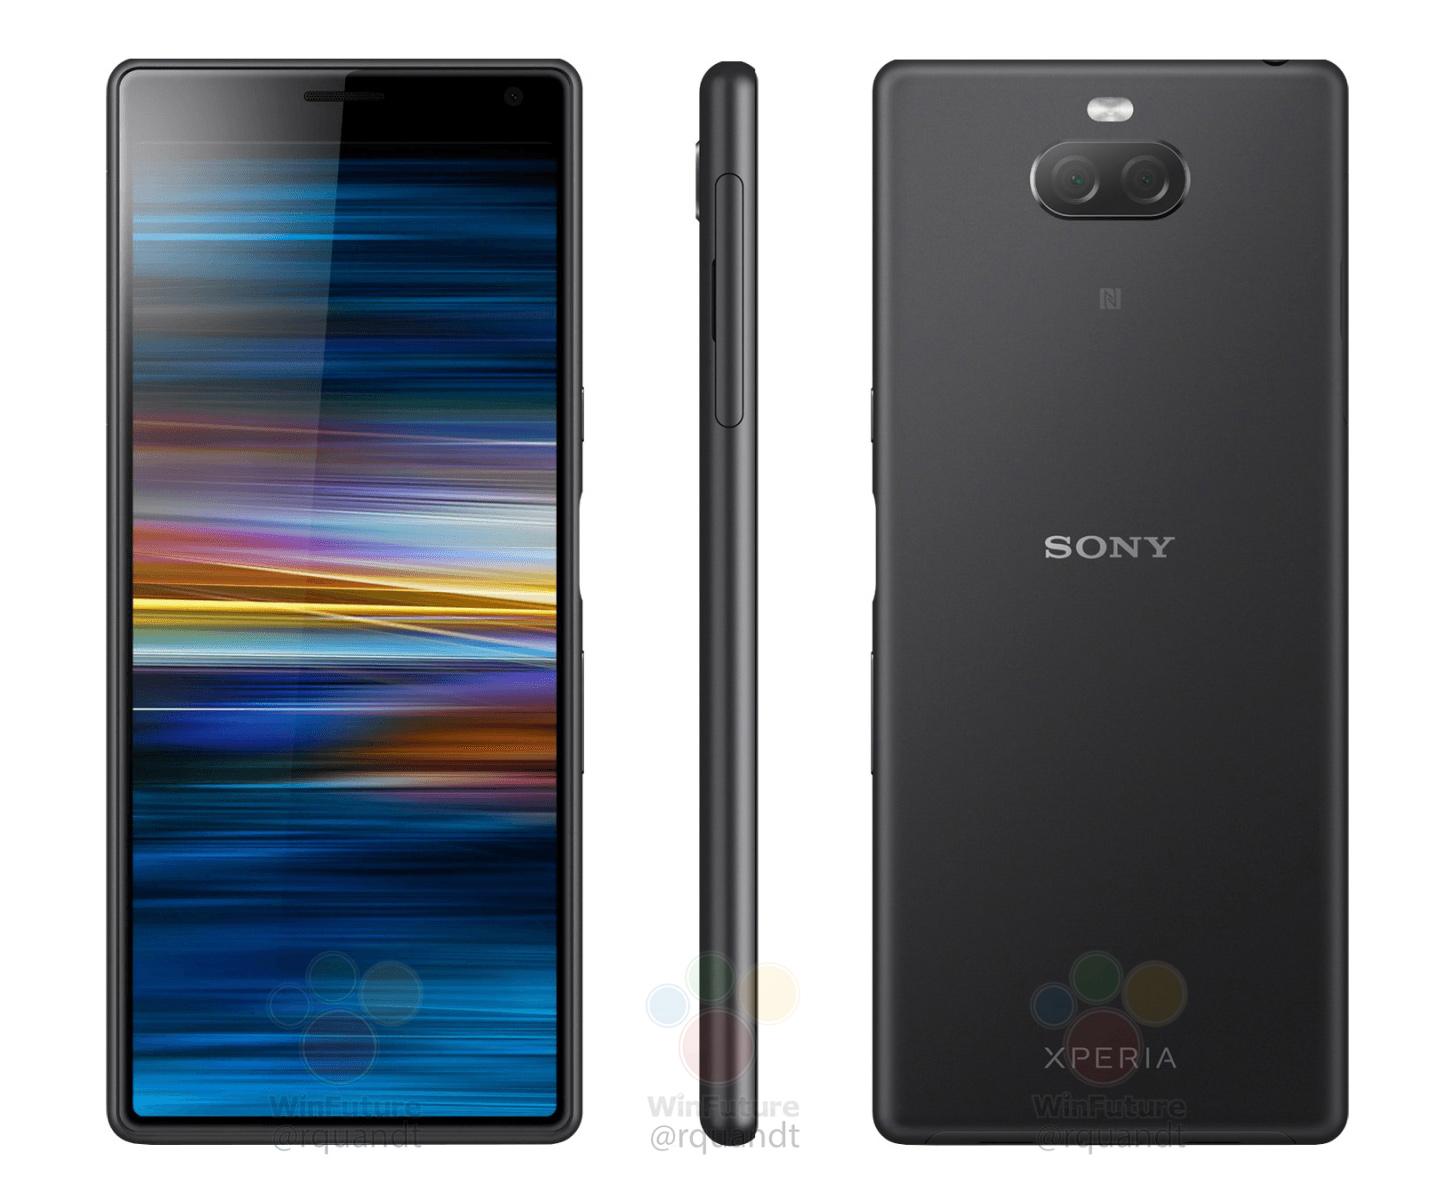 Sony Xperia XA3 leaks with tall 21:9 display | PhoneDog